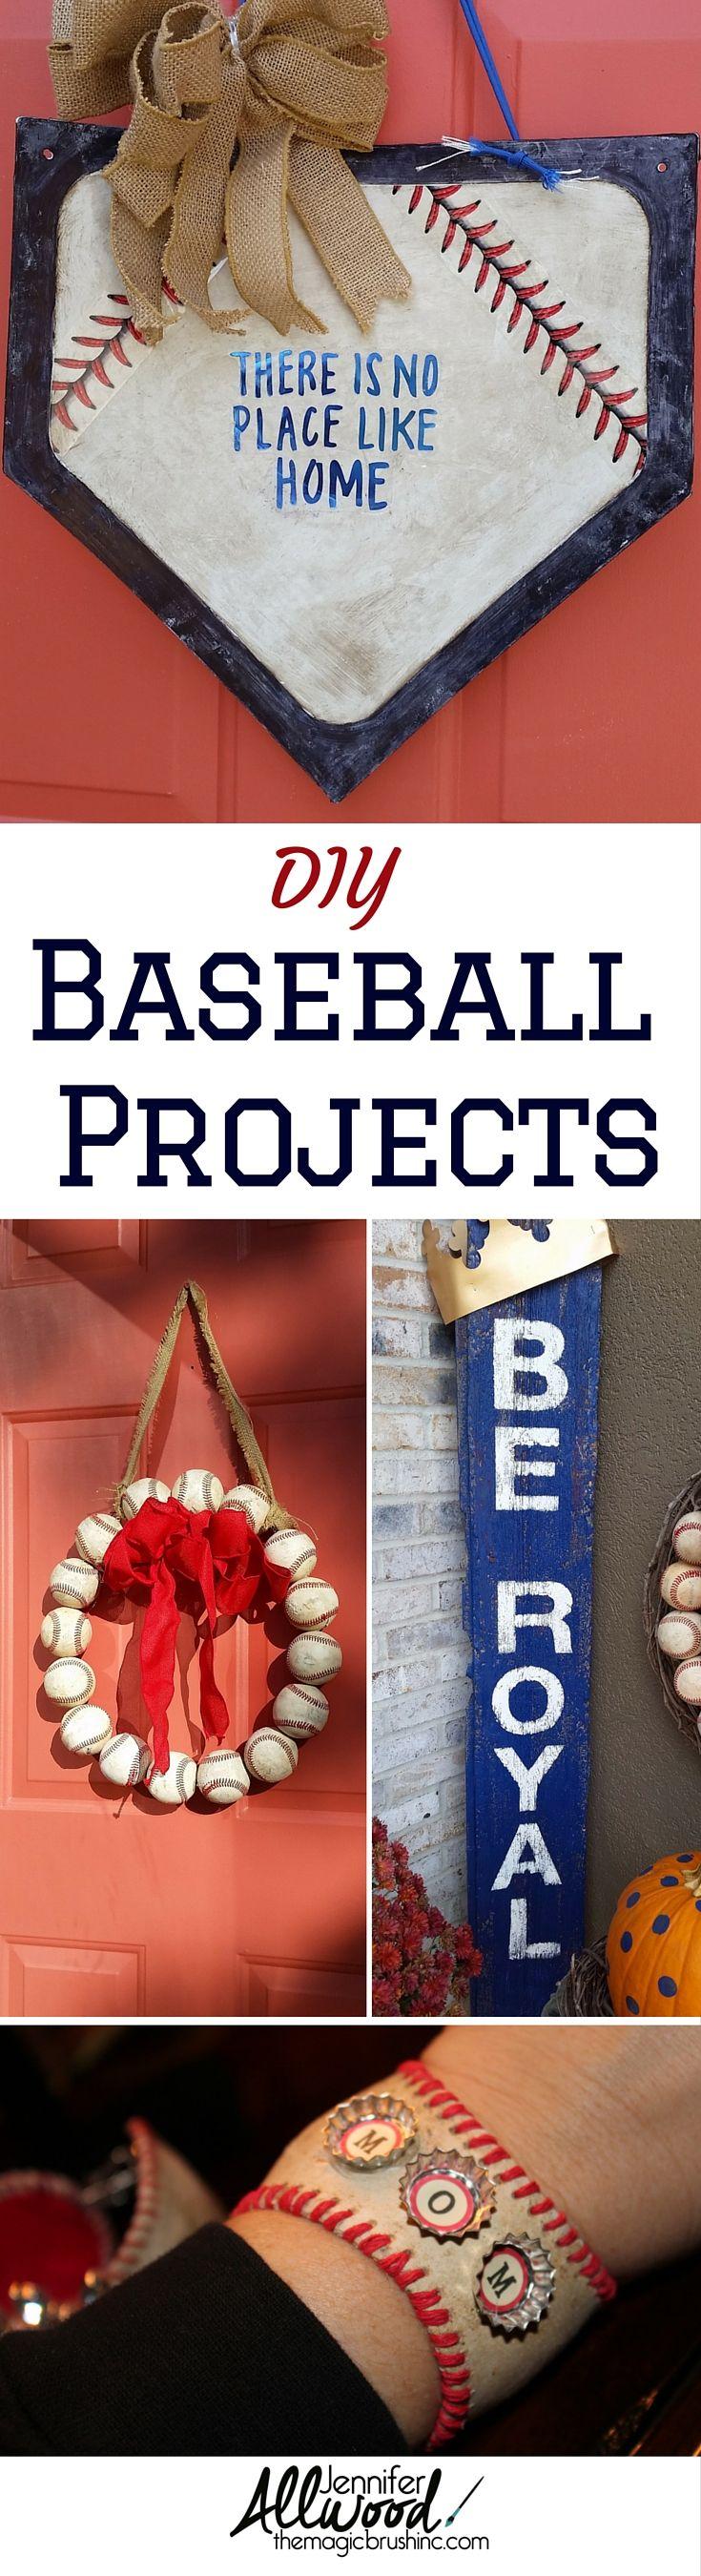 Photo of DIY Baseball Projects